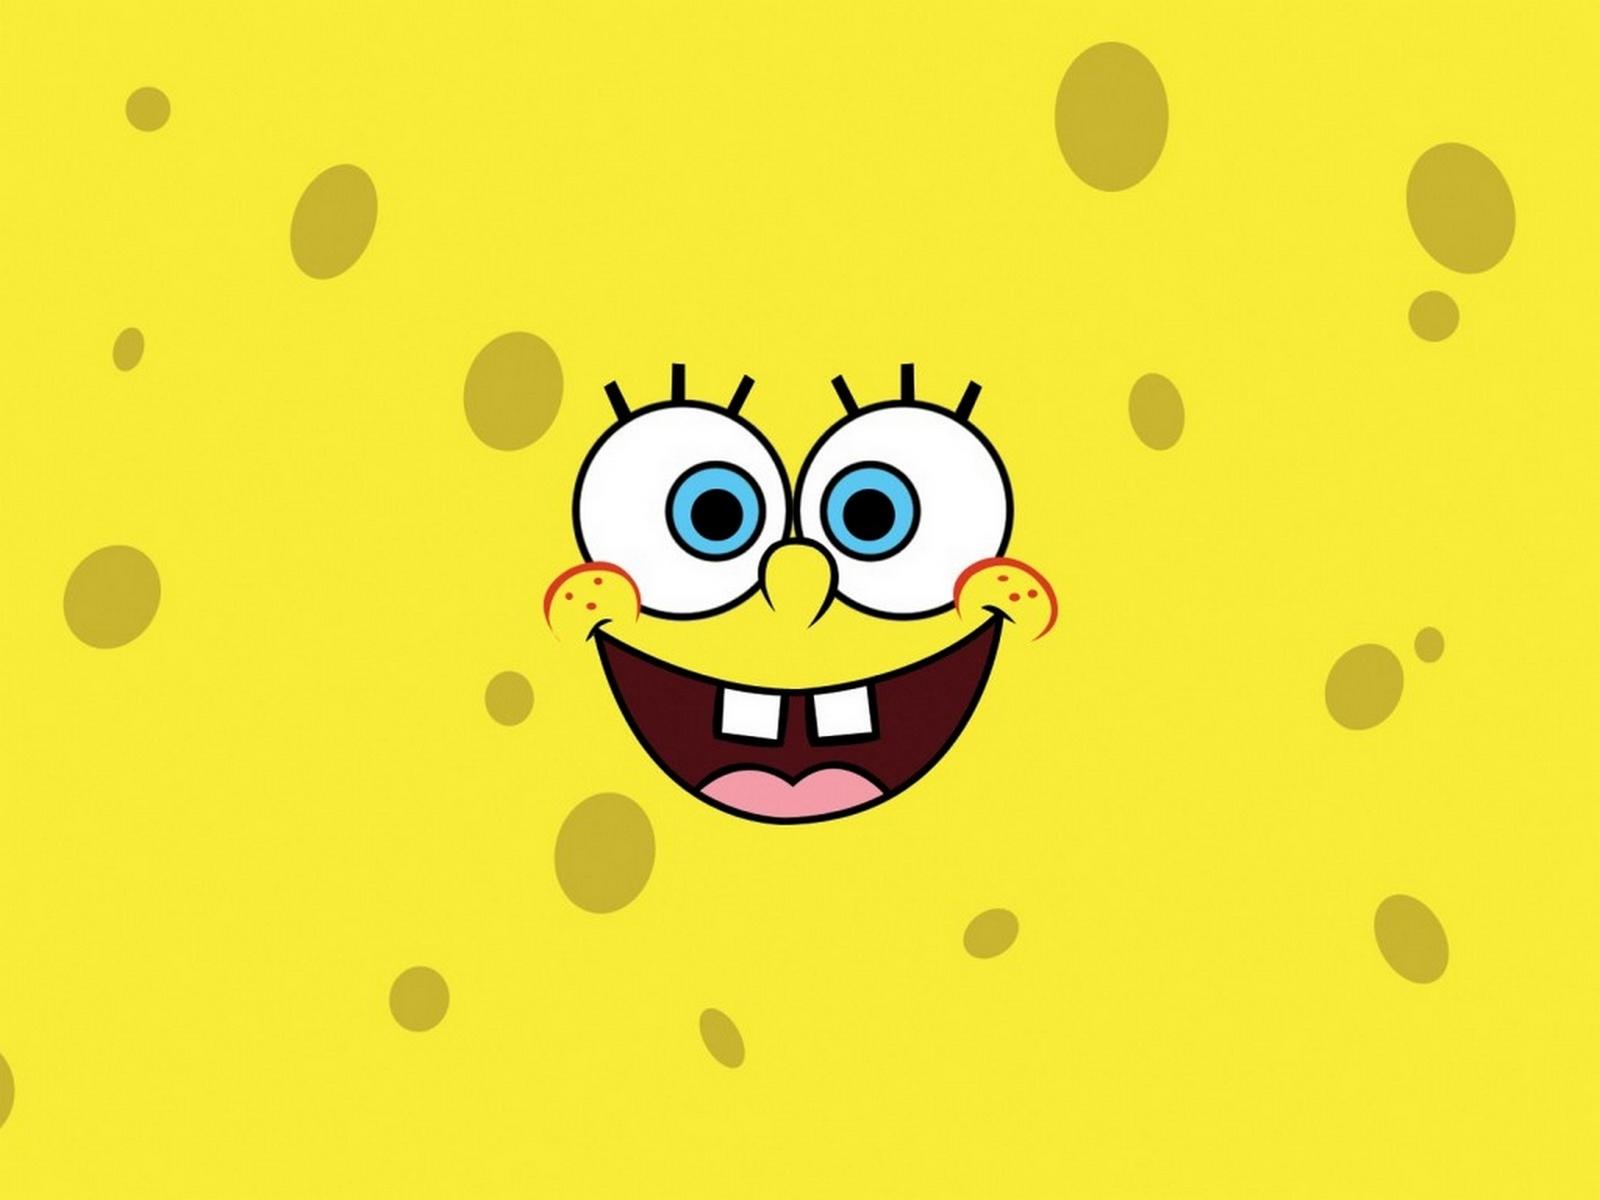 SpongeBob Square Pants HD Wallpapers Download Wallpapers in HD 1600x1200